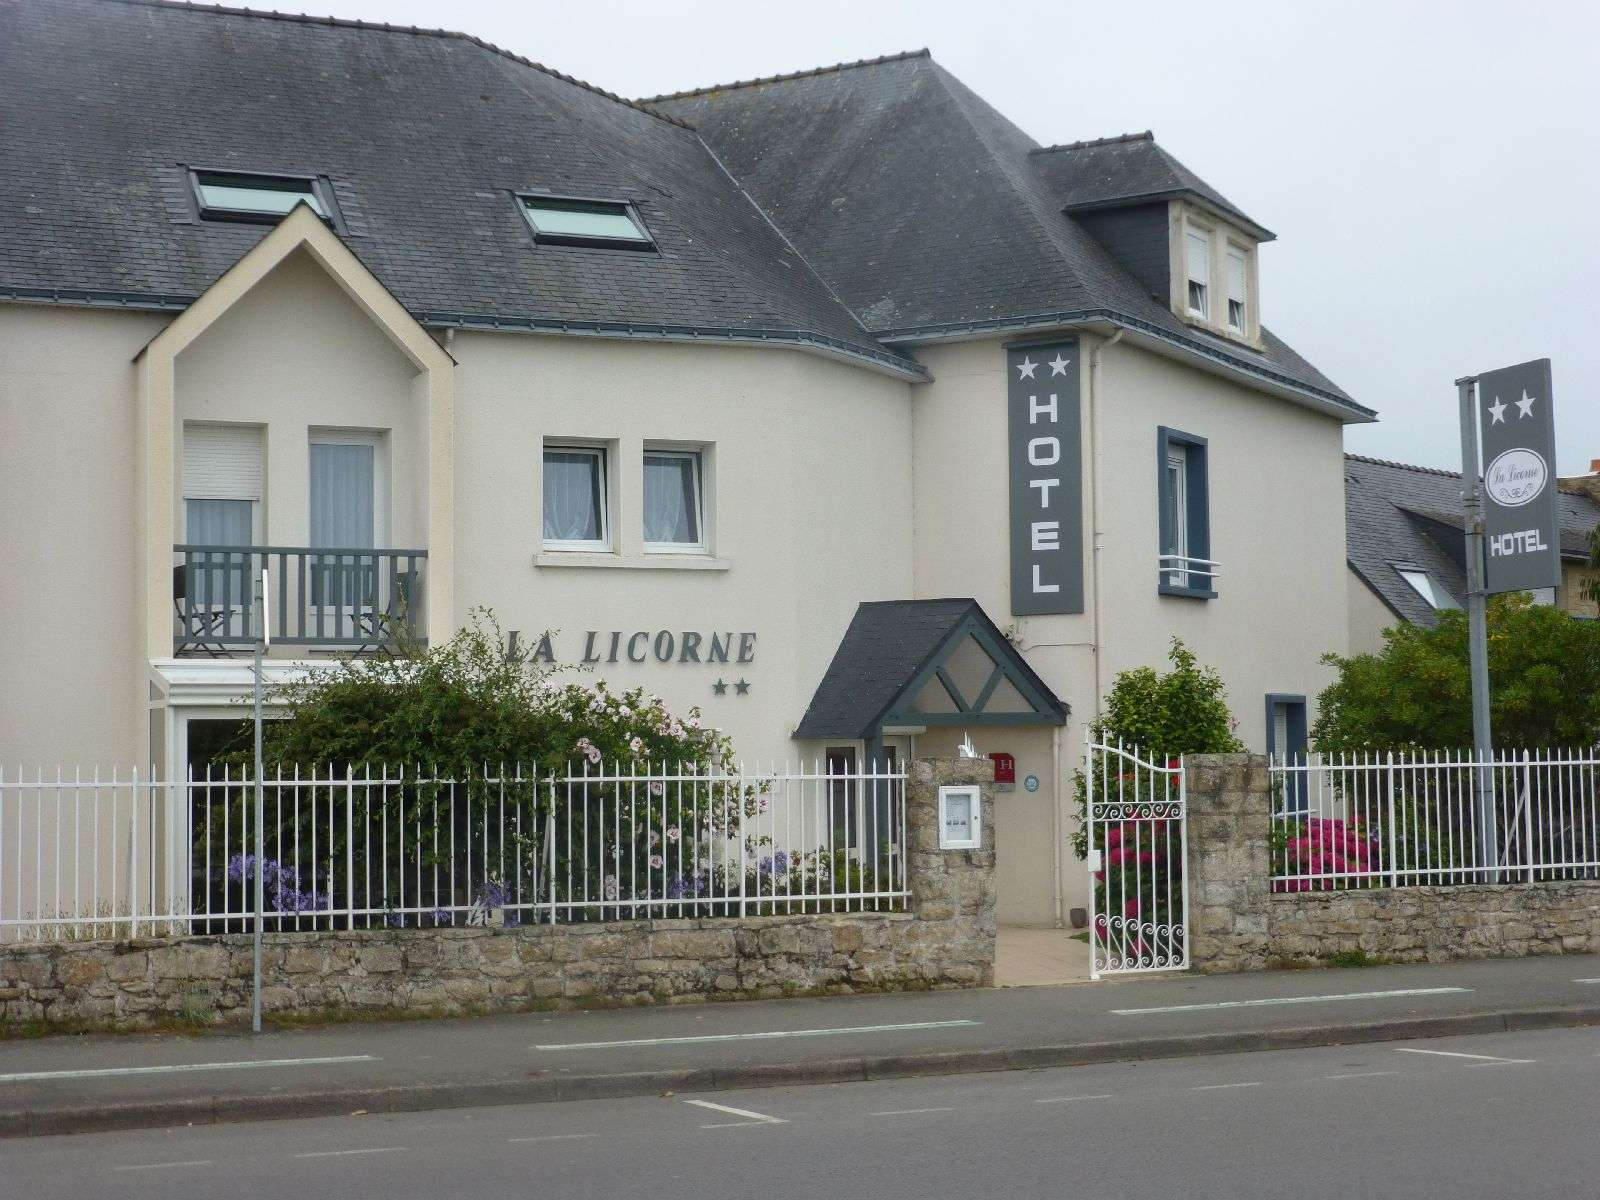 hebergement_hotel-la-licorne_carnac_Morbihan-Bretagne-Sud_resultat